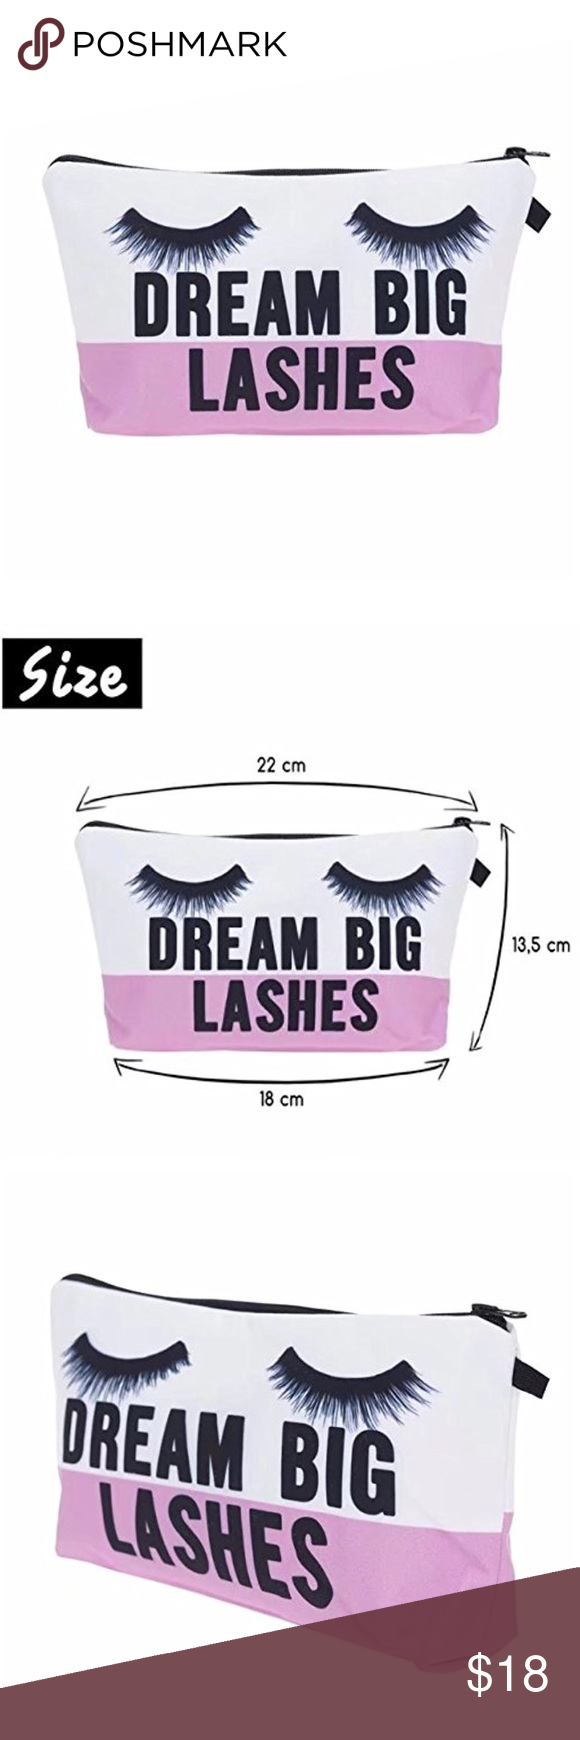 Dream Big Lashes Mini Makeup Bag Boutique Clothes Design Fashion Design Mini Makeup Bag